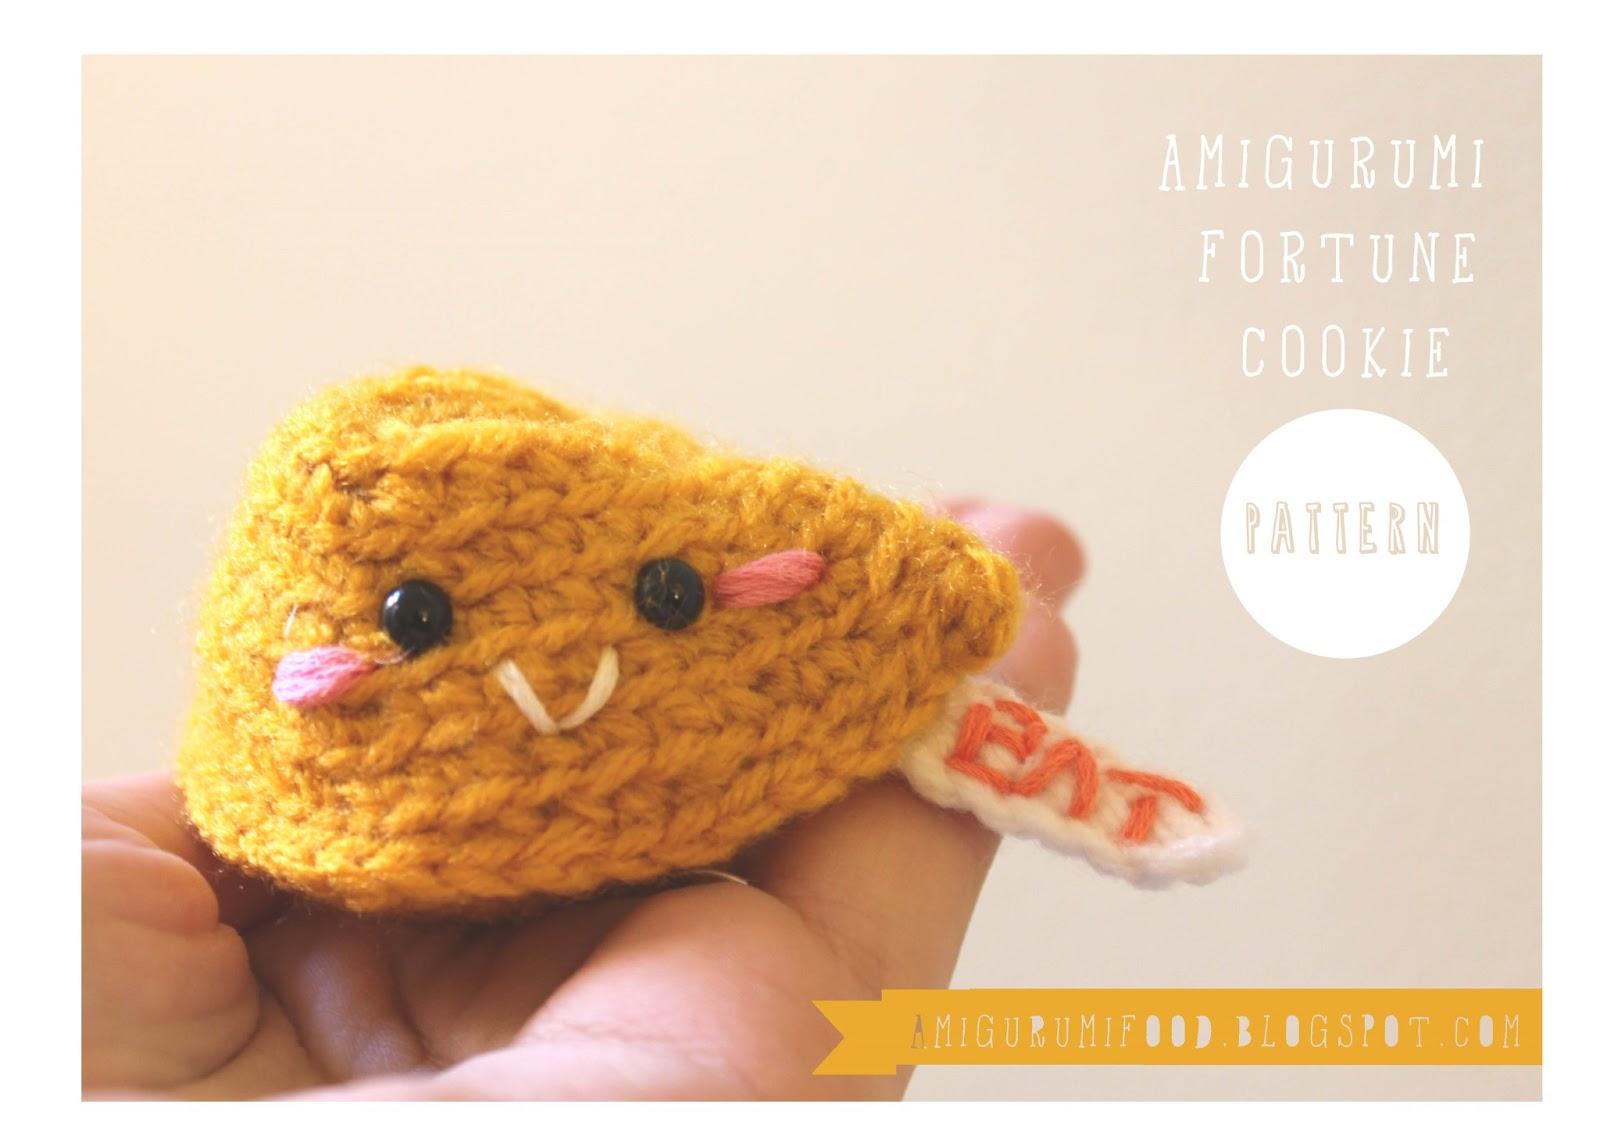 Amigurumi Harry Potter Free Pattern : Amigurumi Food: Fortune Cookie Amigurumi